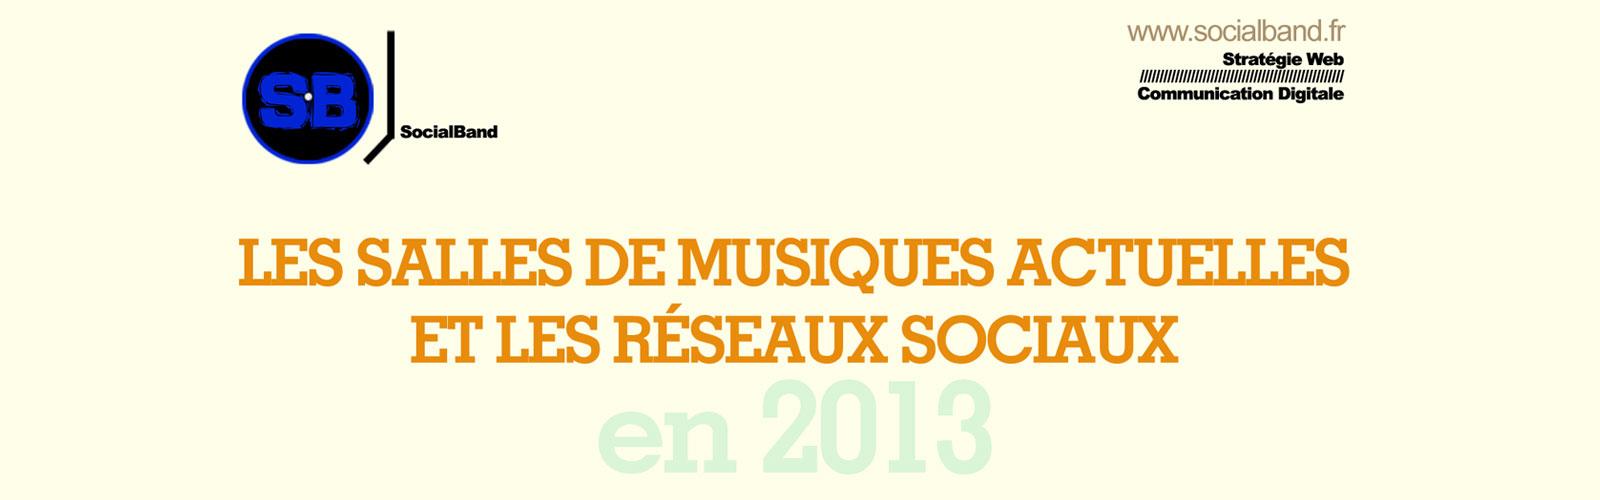 etude-socialband-social-2013